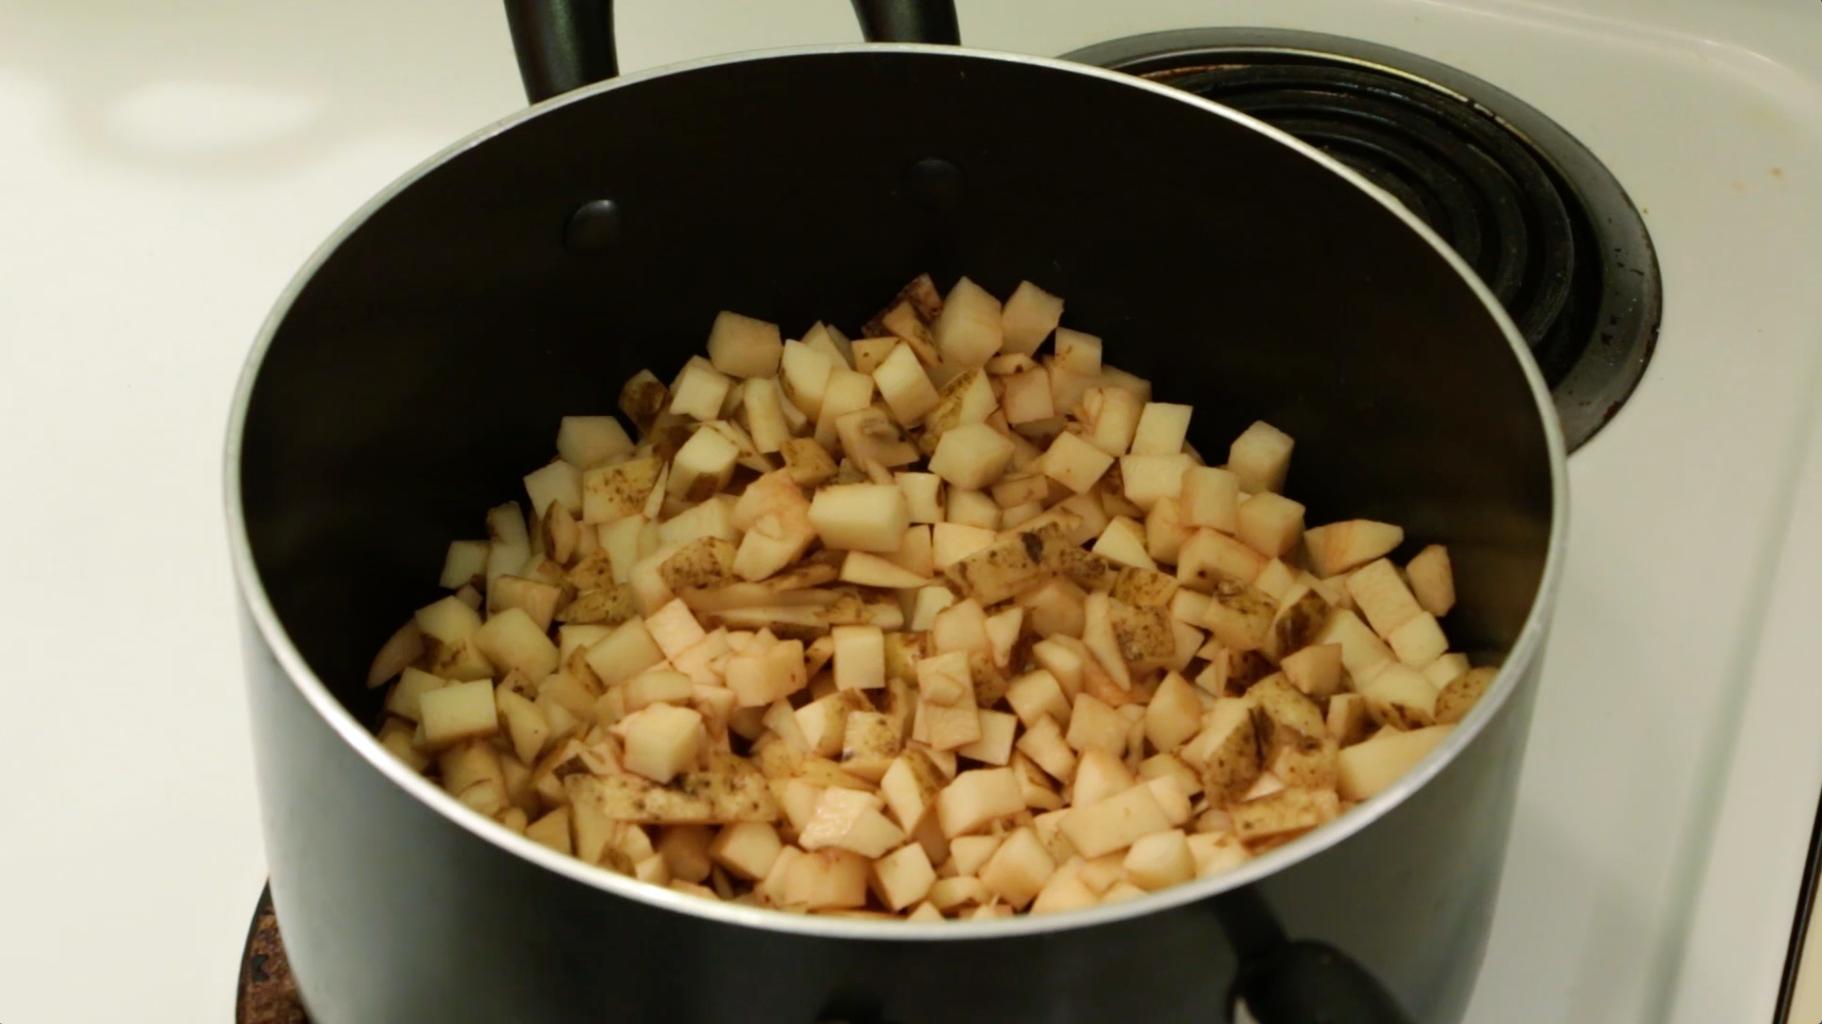 Combine Potatoes, Celery, Ham, and Onion